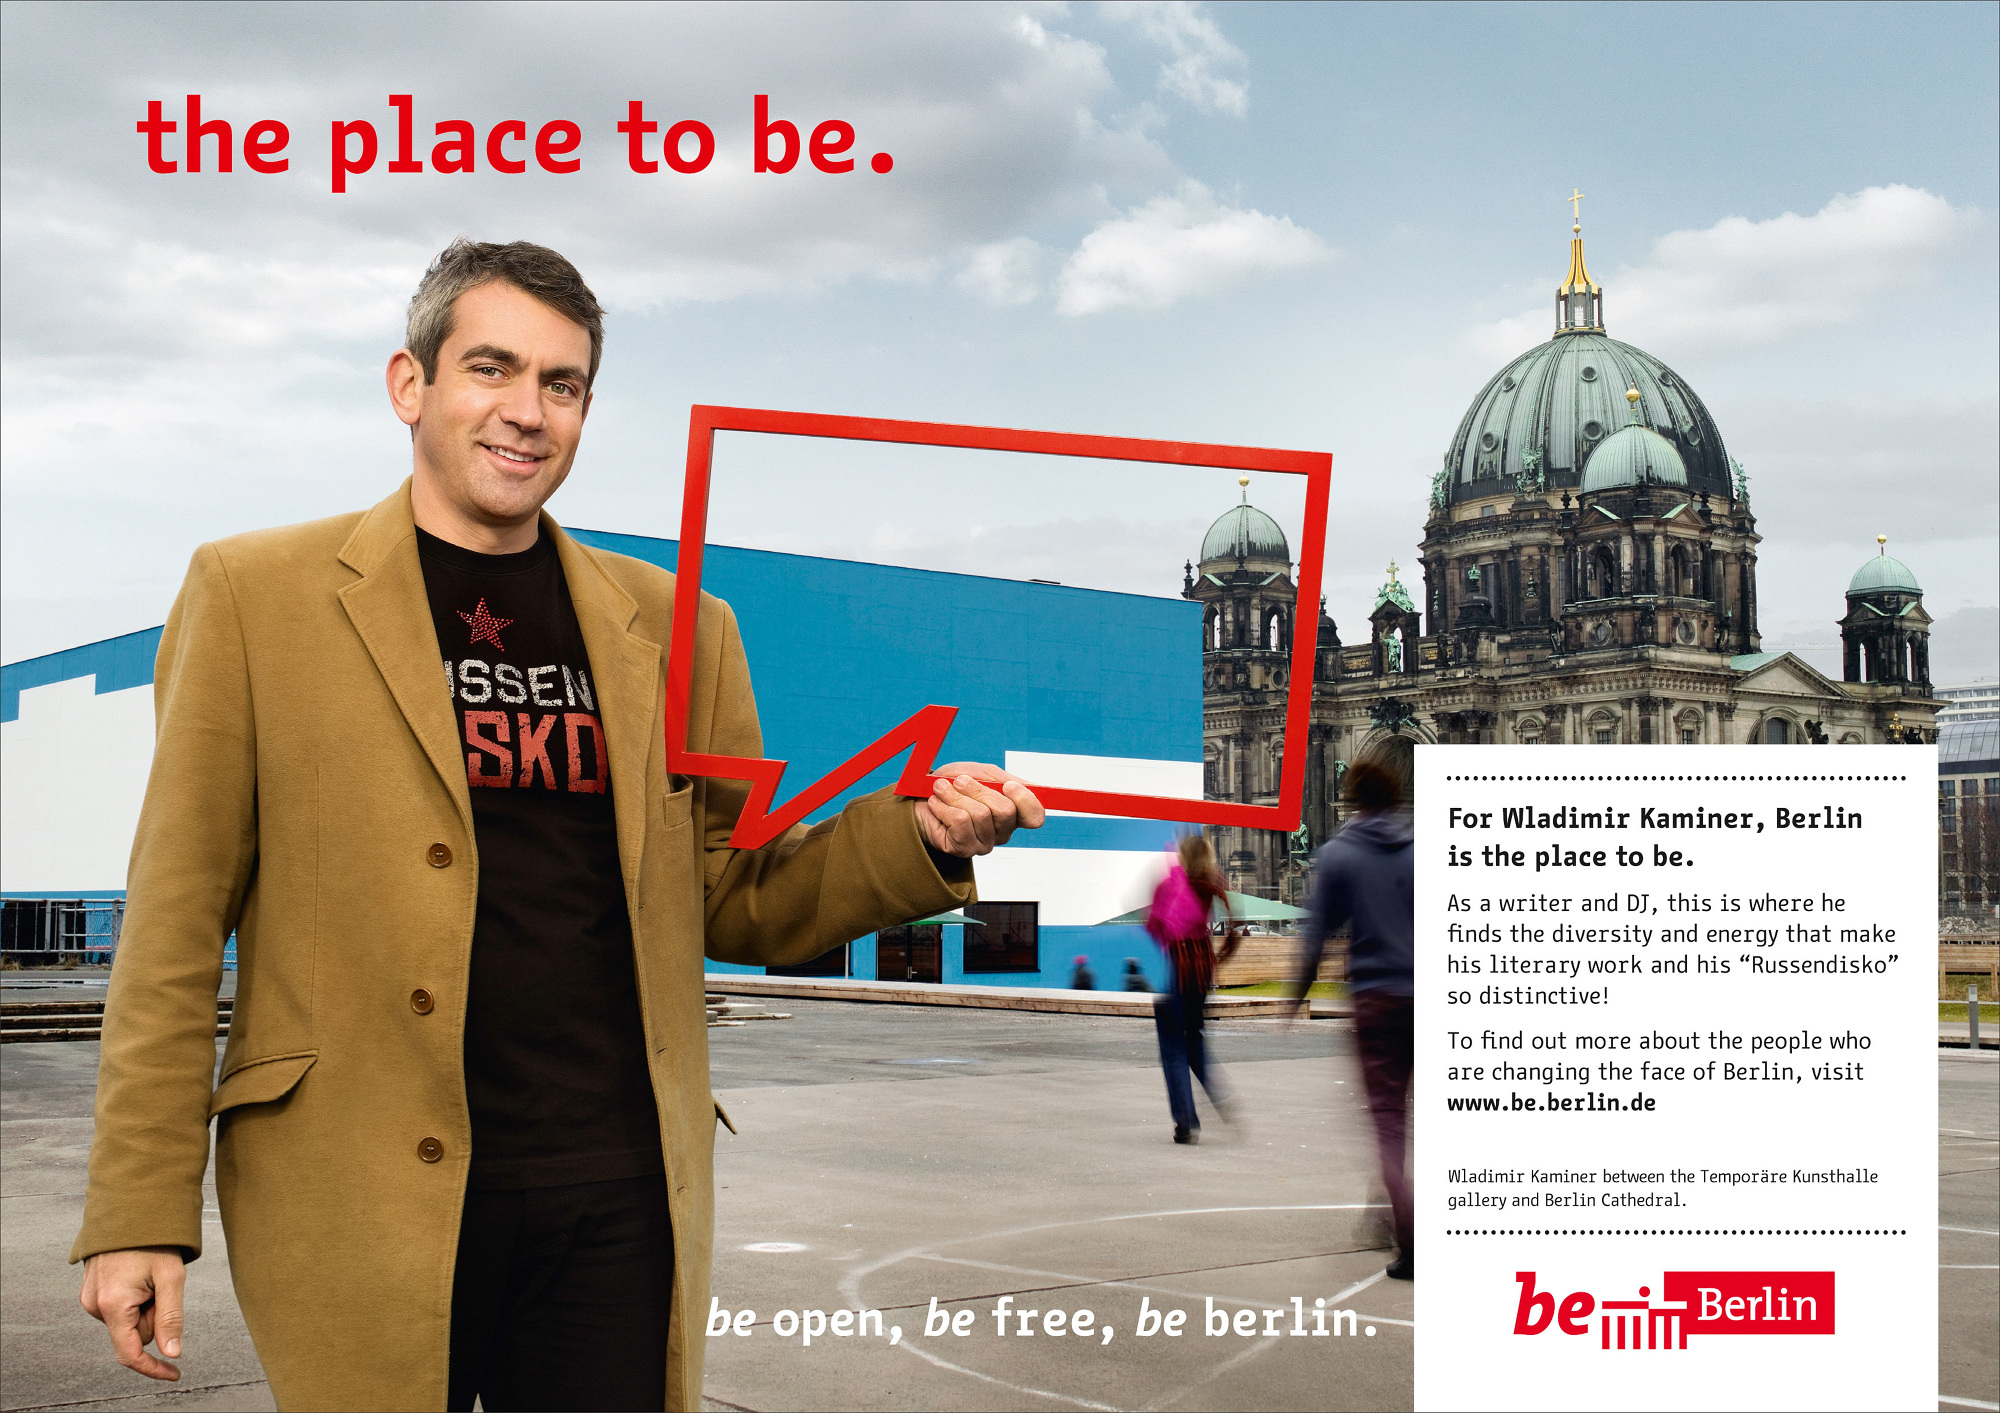 berlin-be